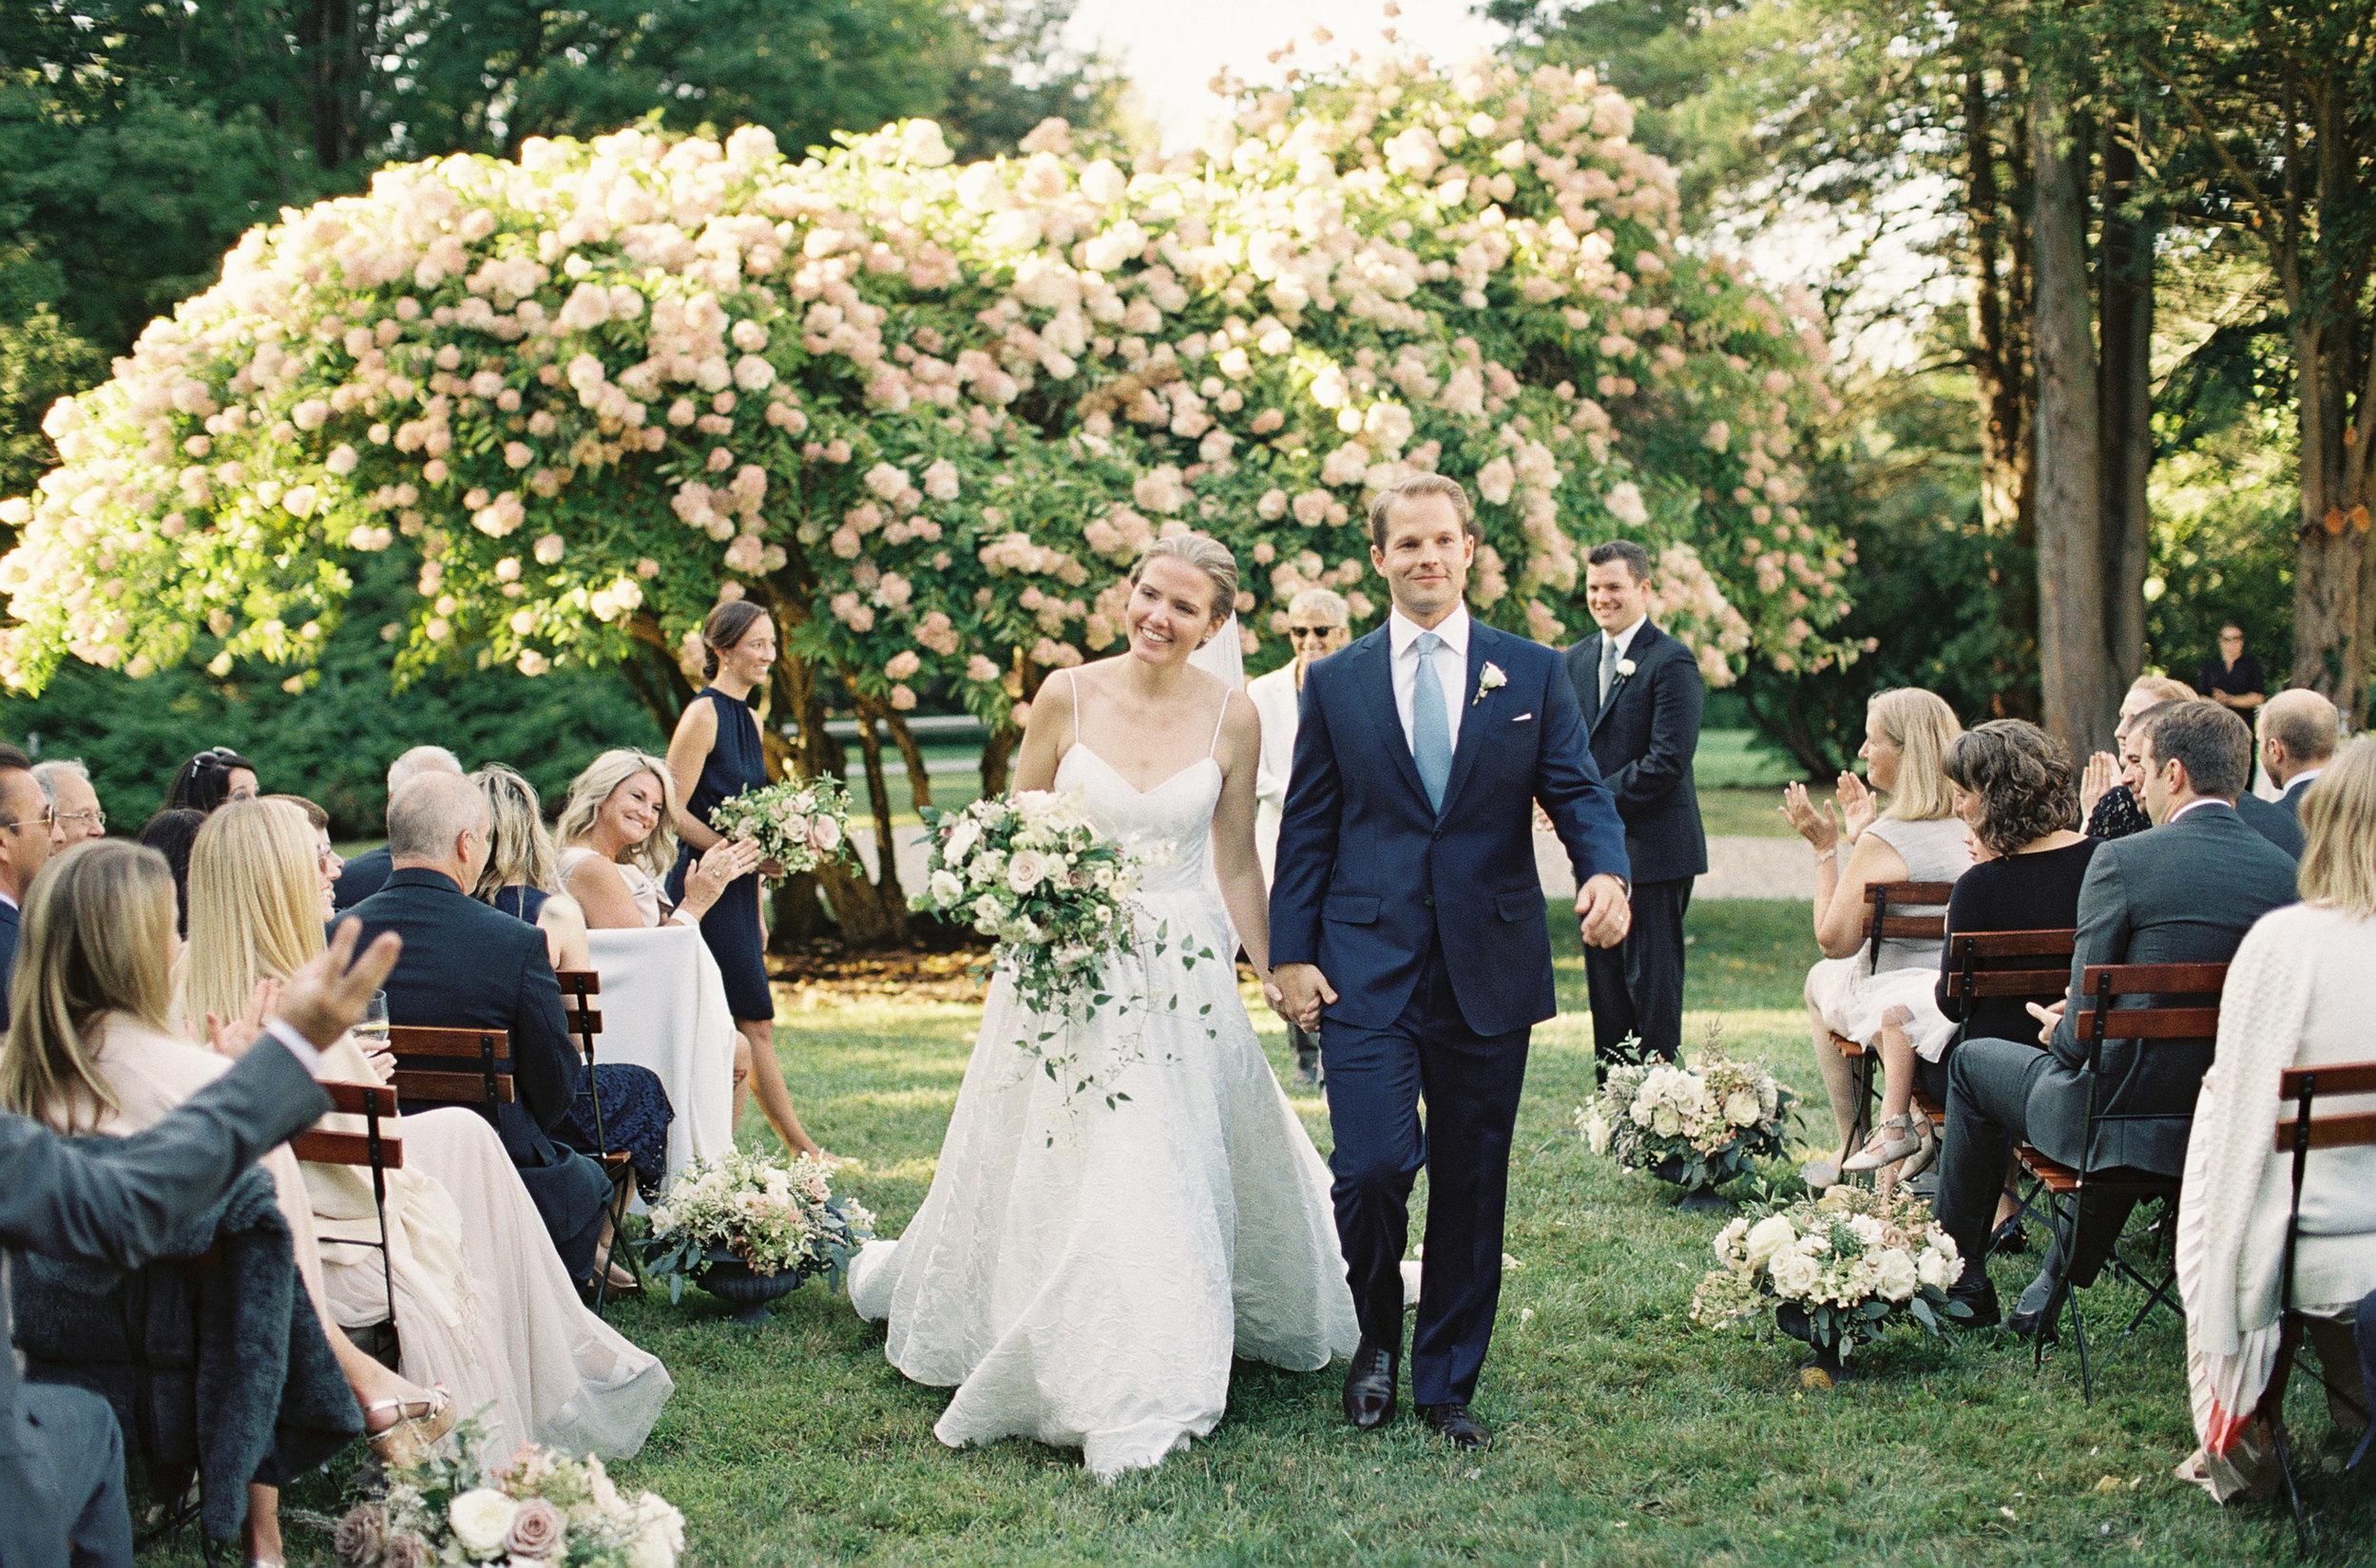 Connecticut-Wedding-31-Jen-Huang-20170909-KB-222-Jen_Huang-006798-R1-024.jpg